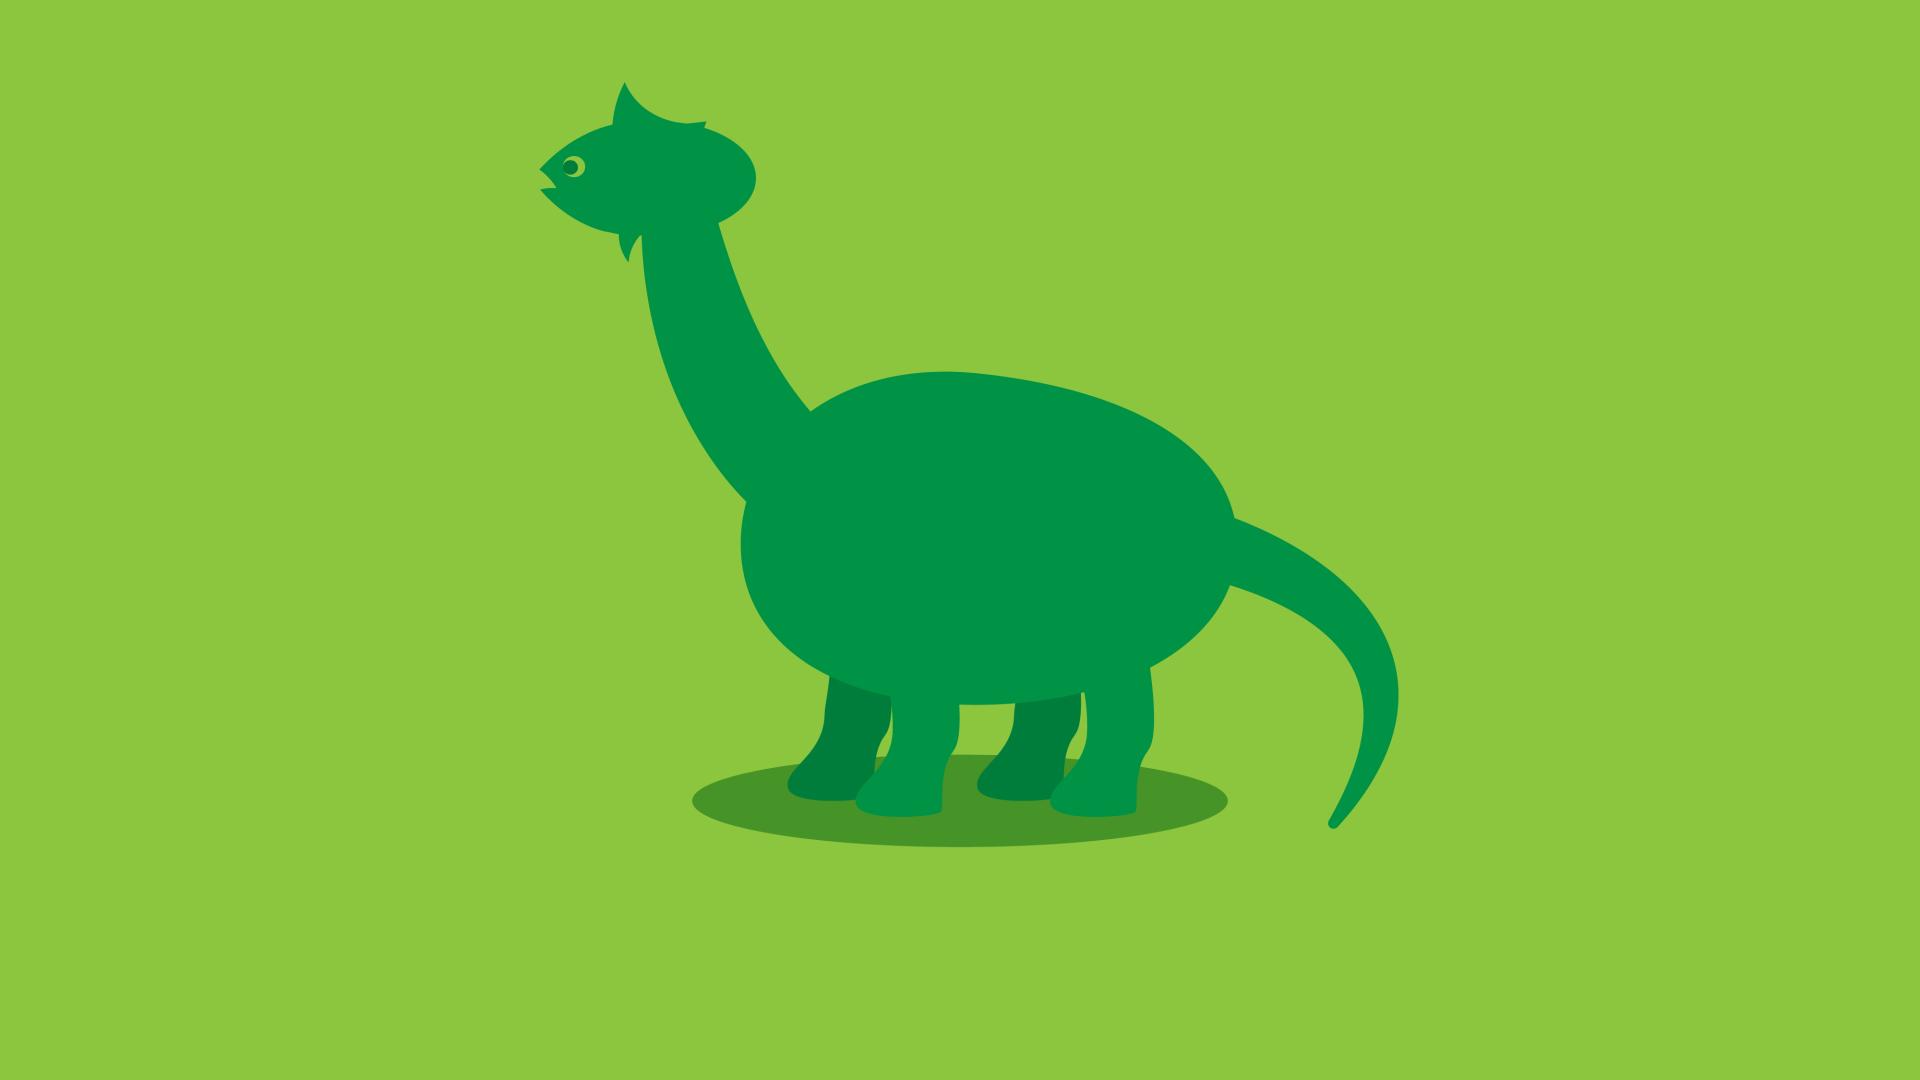 1920x1080 Brontosaurus Dinosaur Minimalist 1080p Laptop Full Hd Wallpaper Hd Minimalist 4k Wallpapers Images Photos And Background